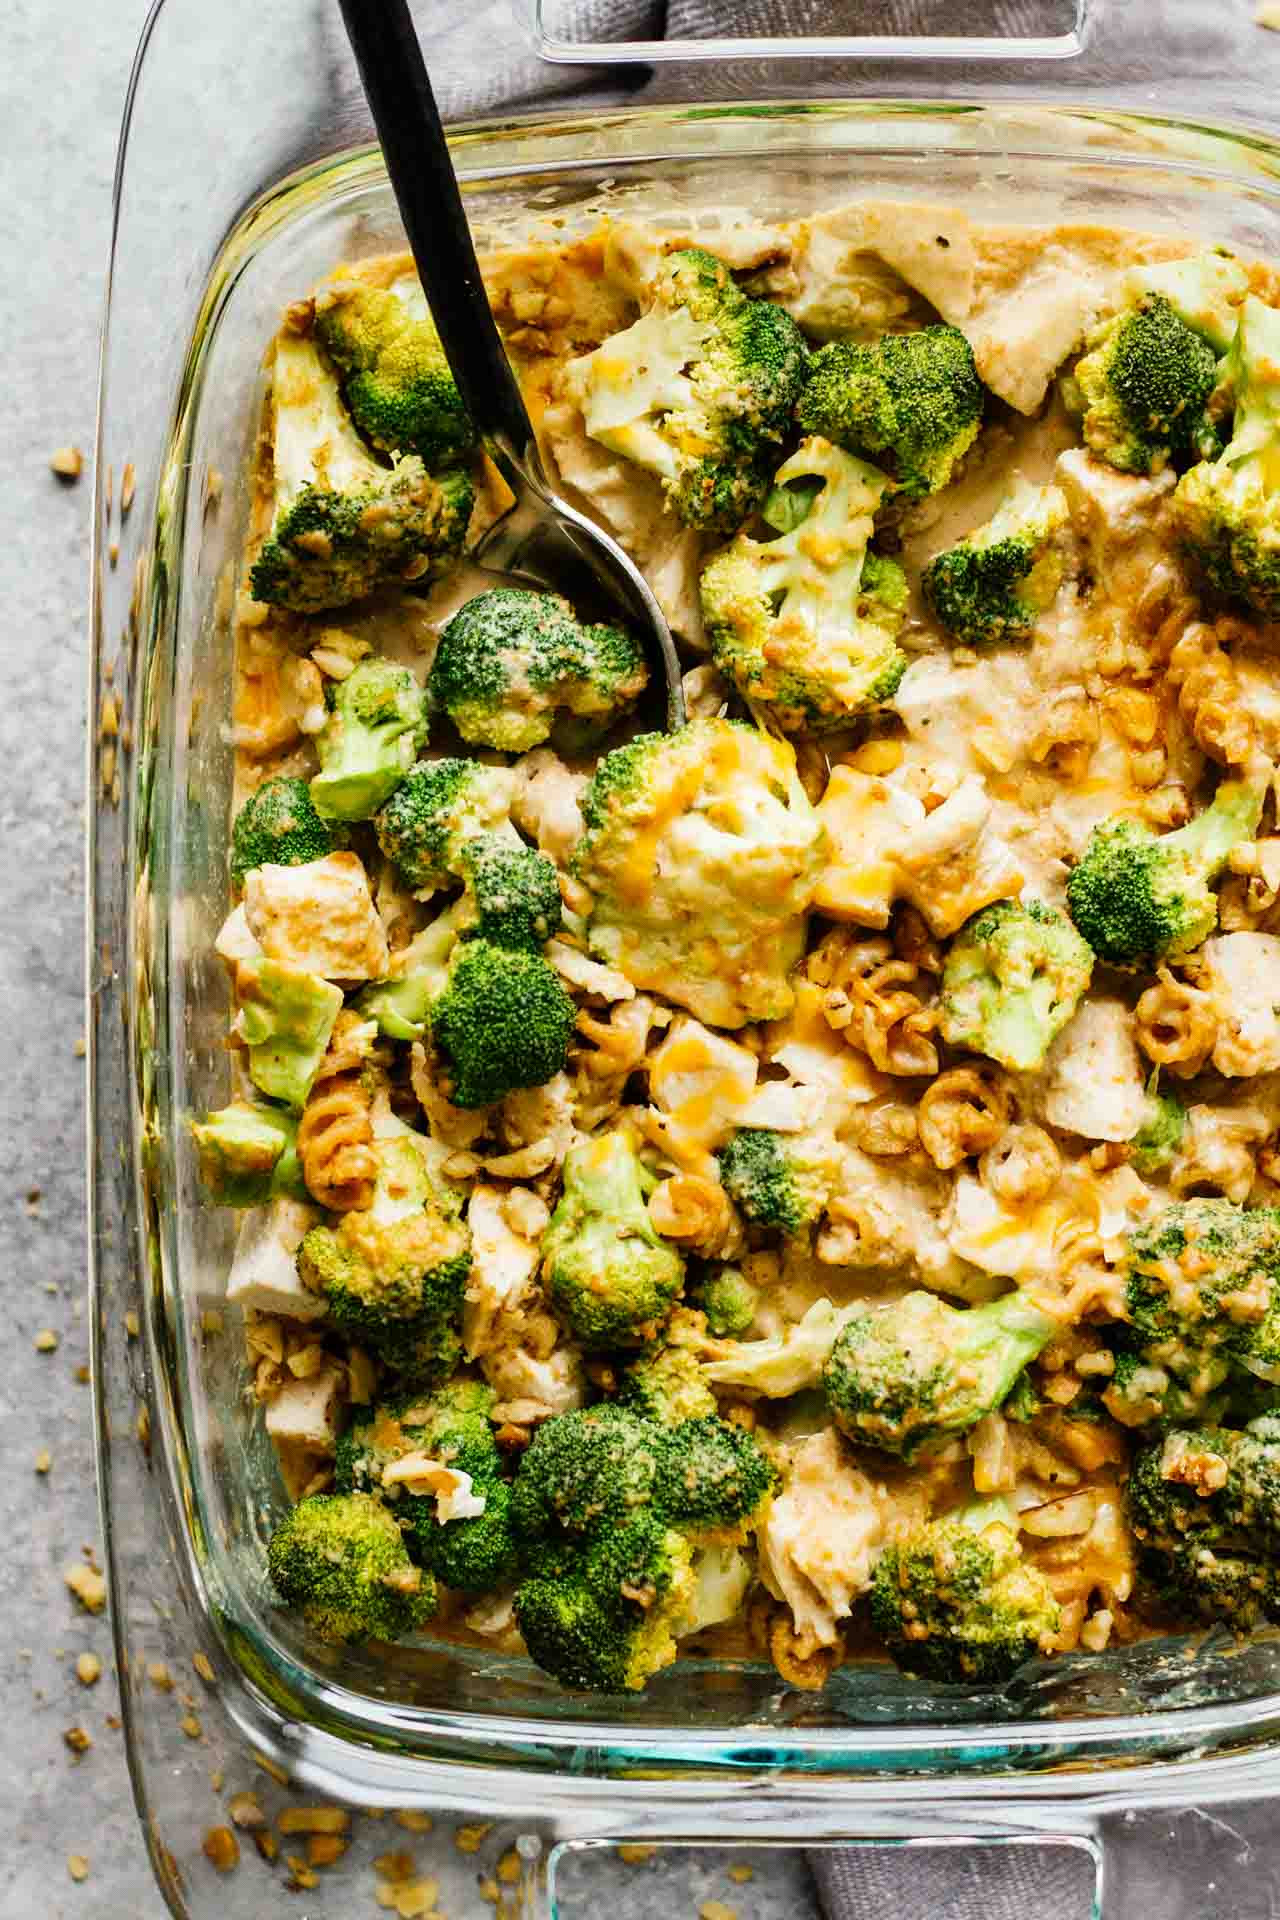 Healthy Broccoli Casserole  Healthy Chicken Broccoli Pasta Casserole Jar Lemons